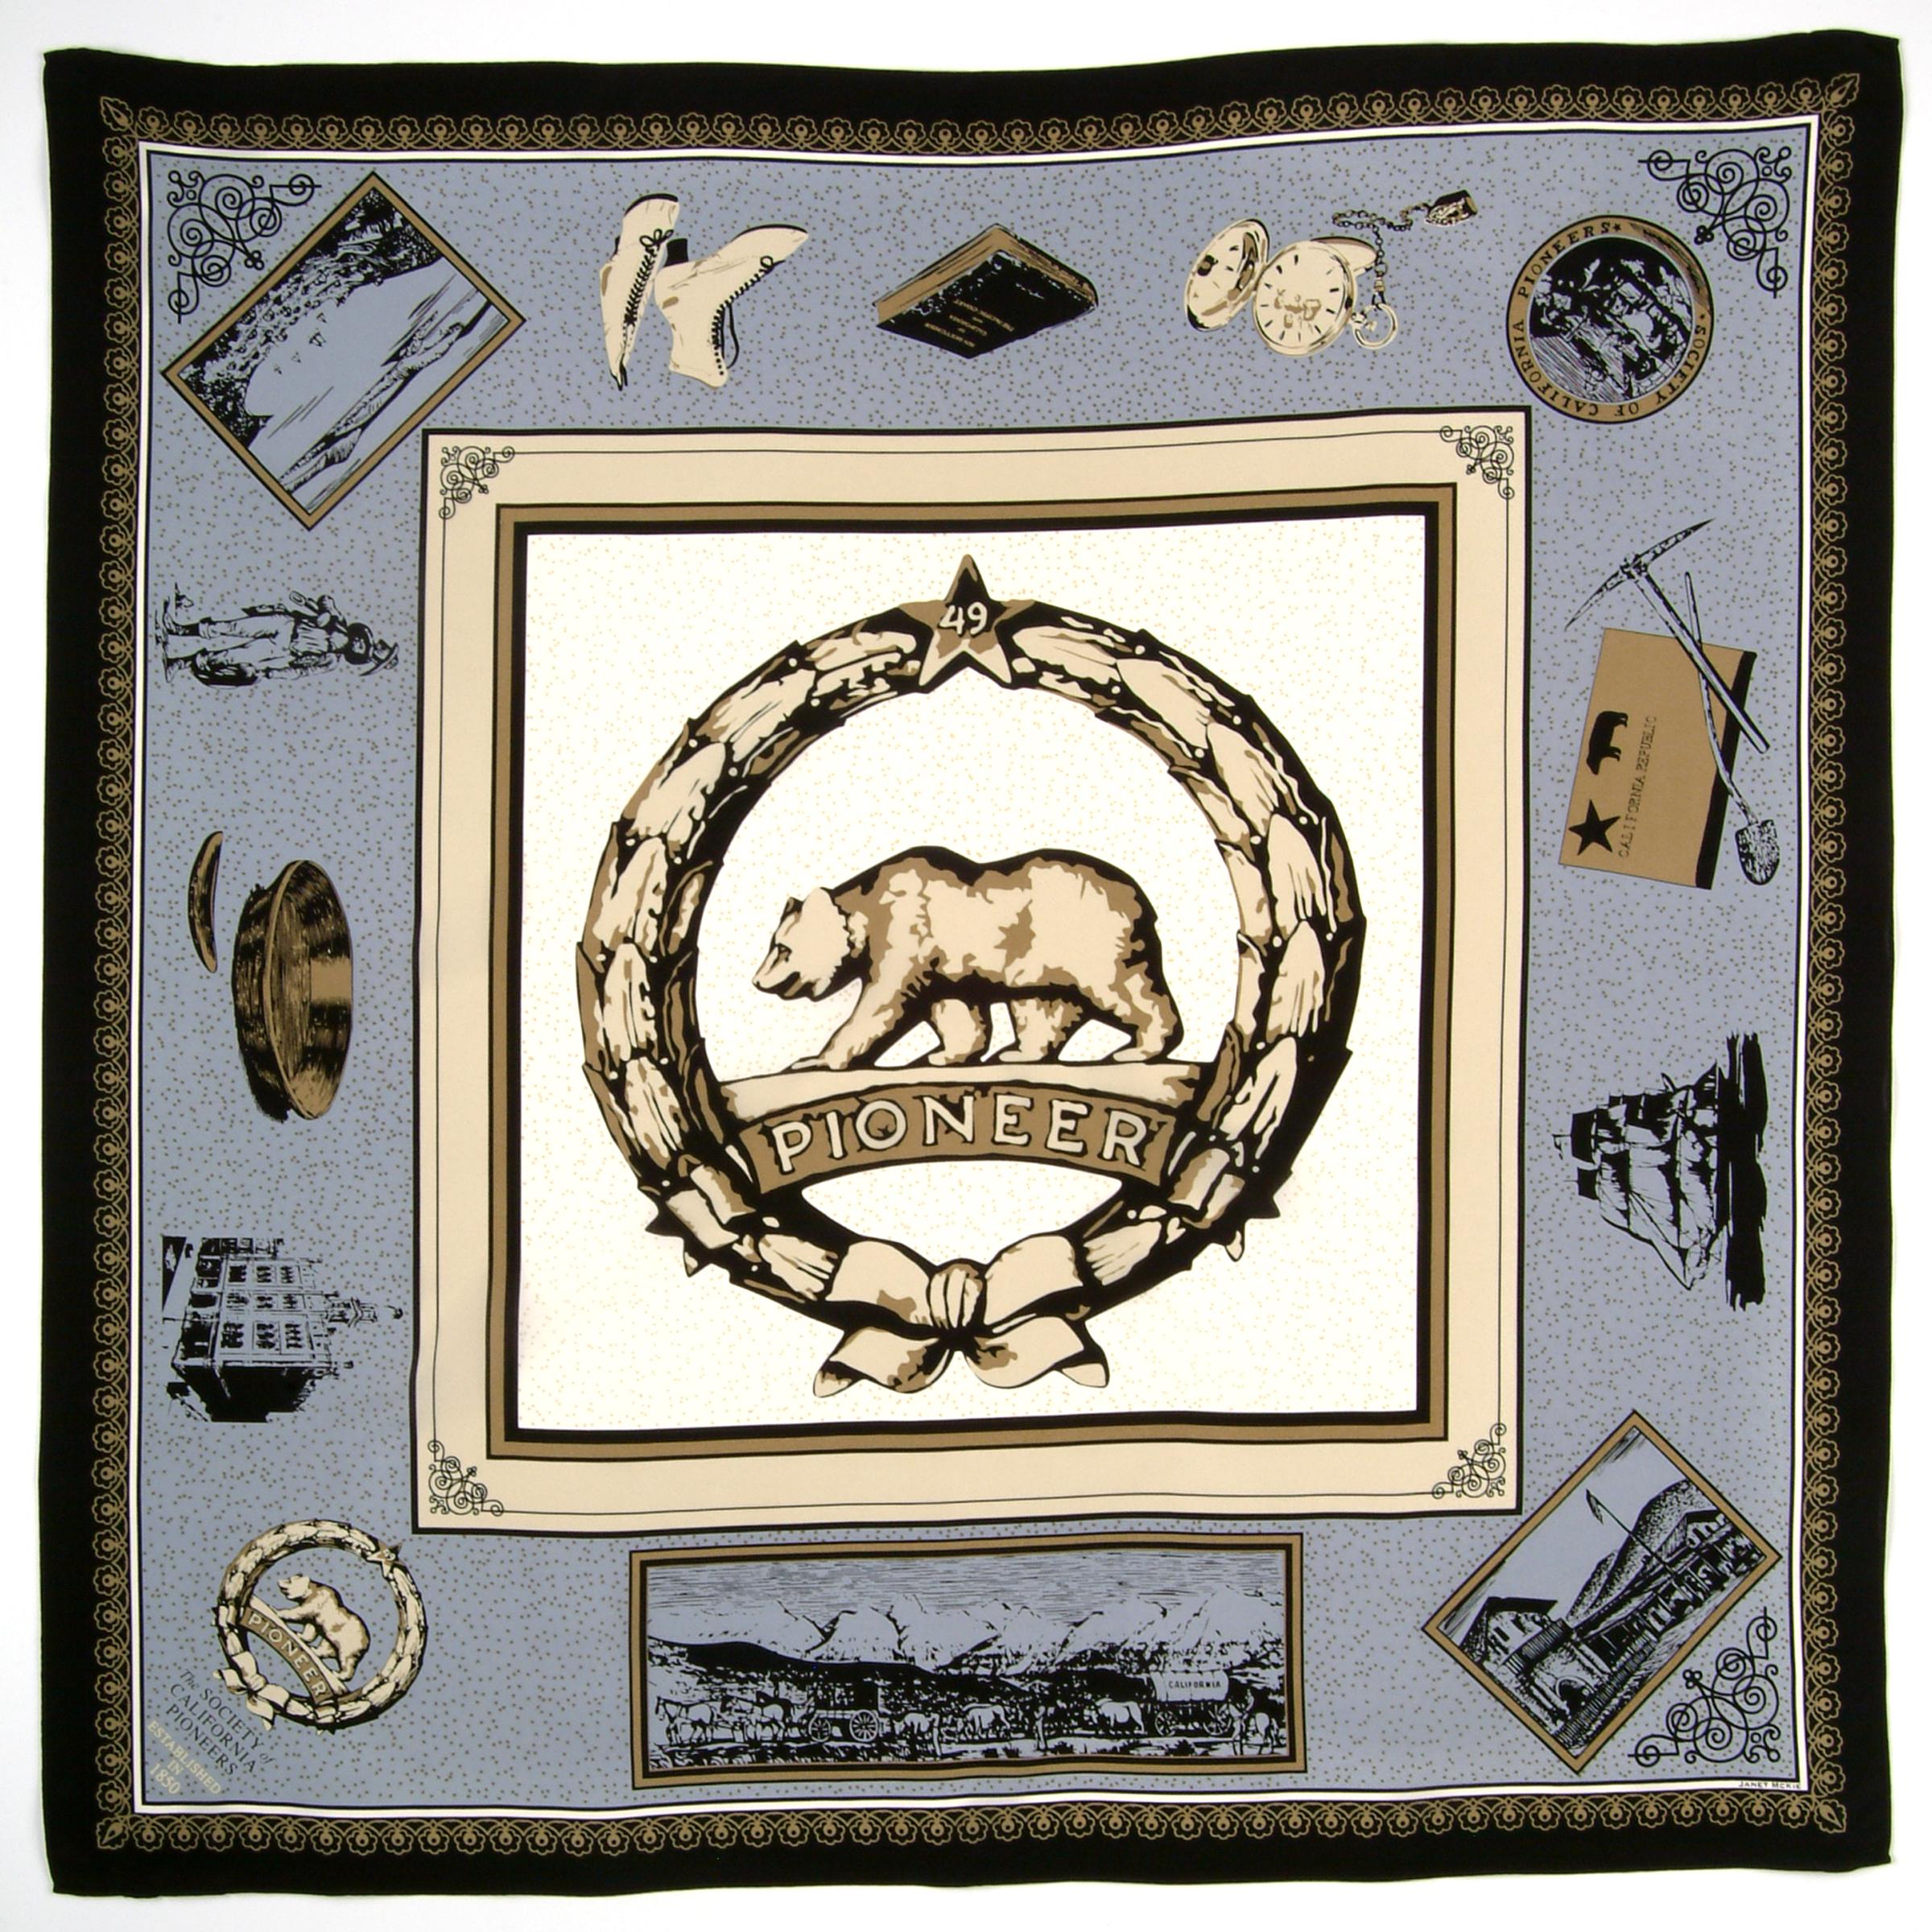 Society of California Pioneers